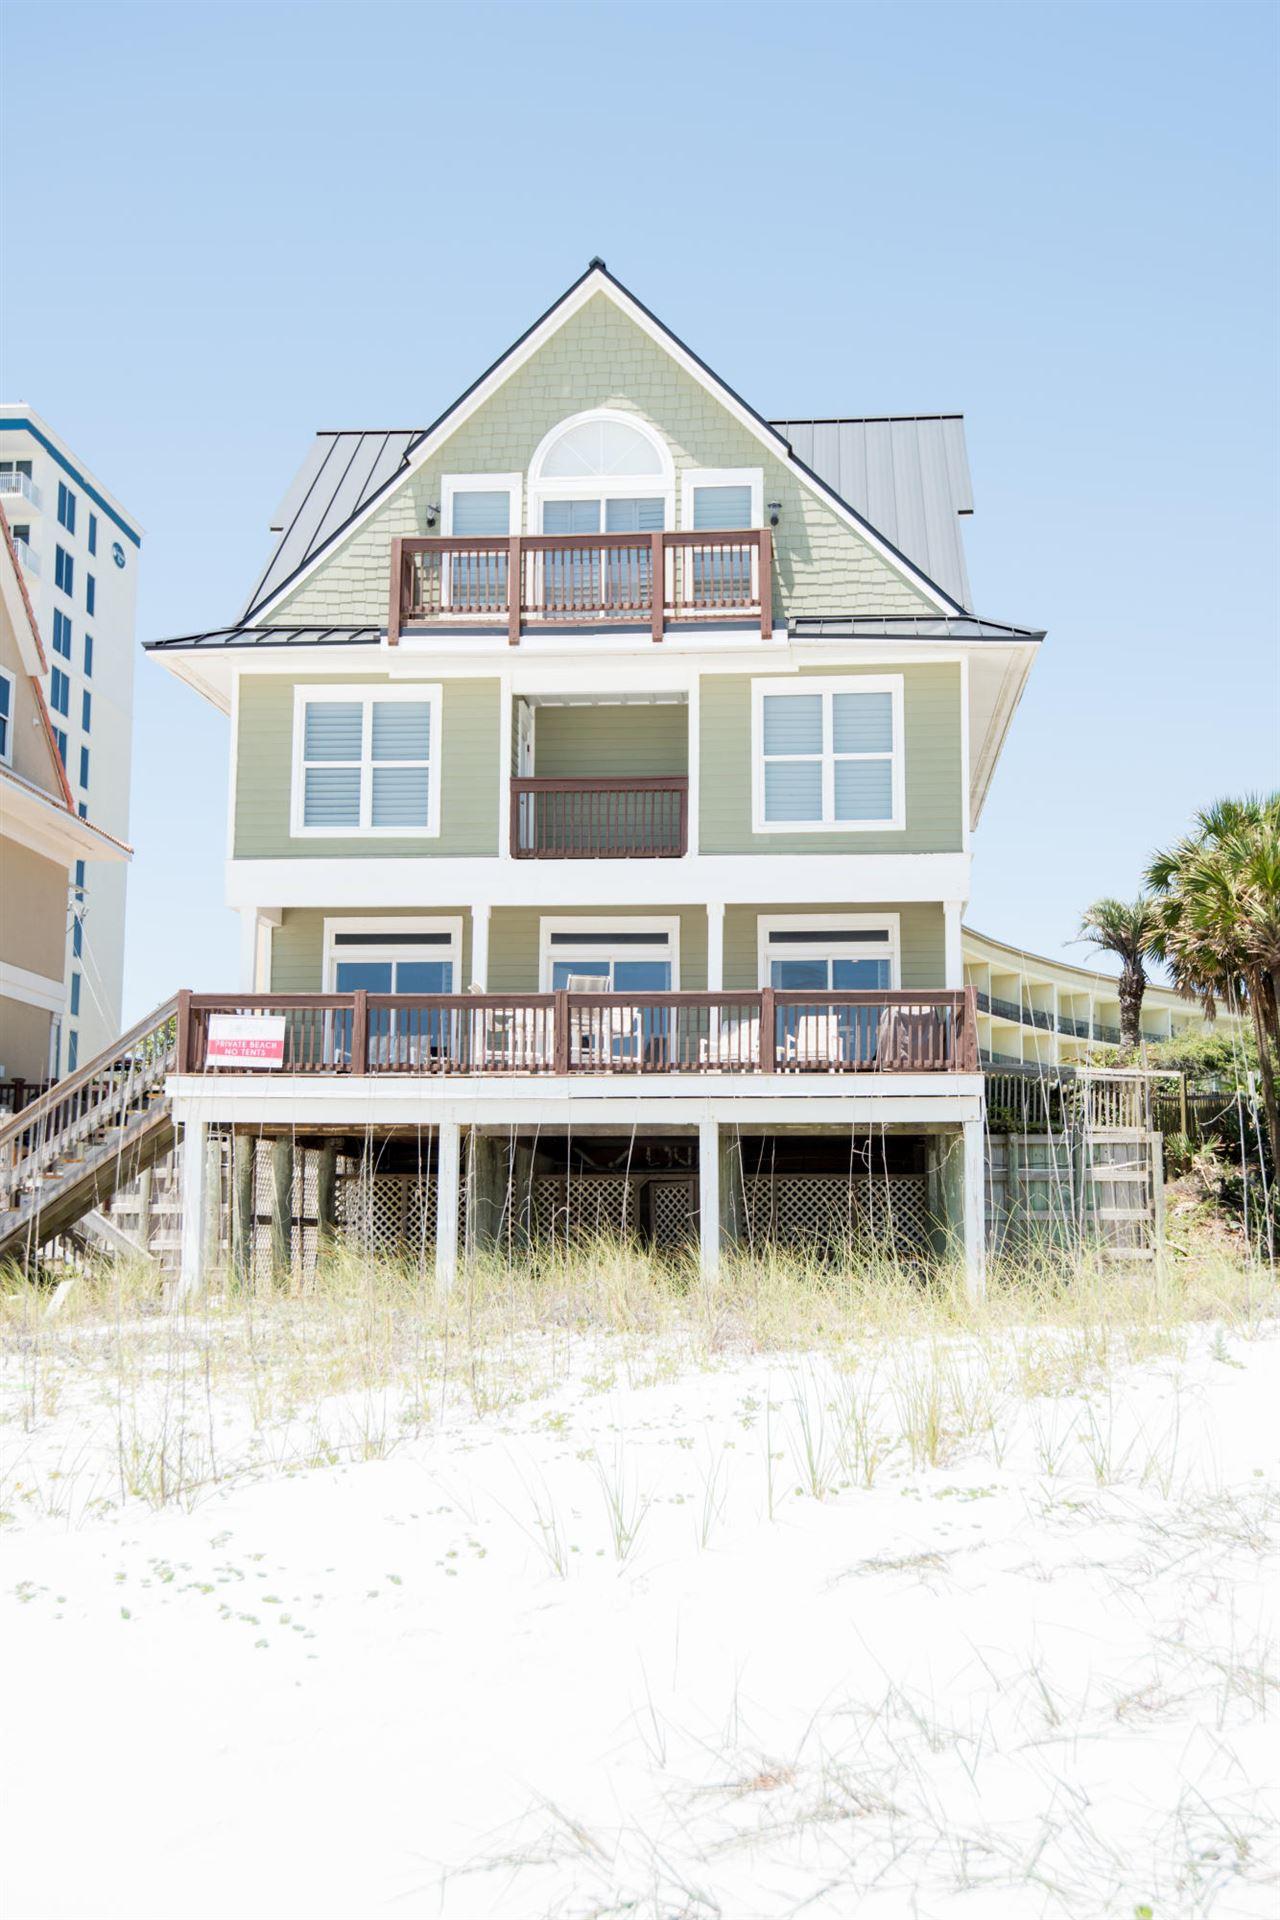 Photo for 2891 Scenic Gulf Drive, Miramar Beach, FL 32550 (MLS # 820178)